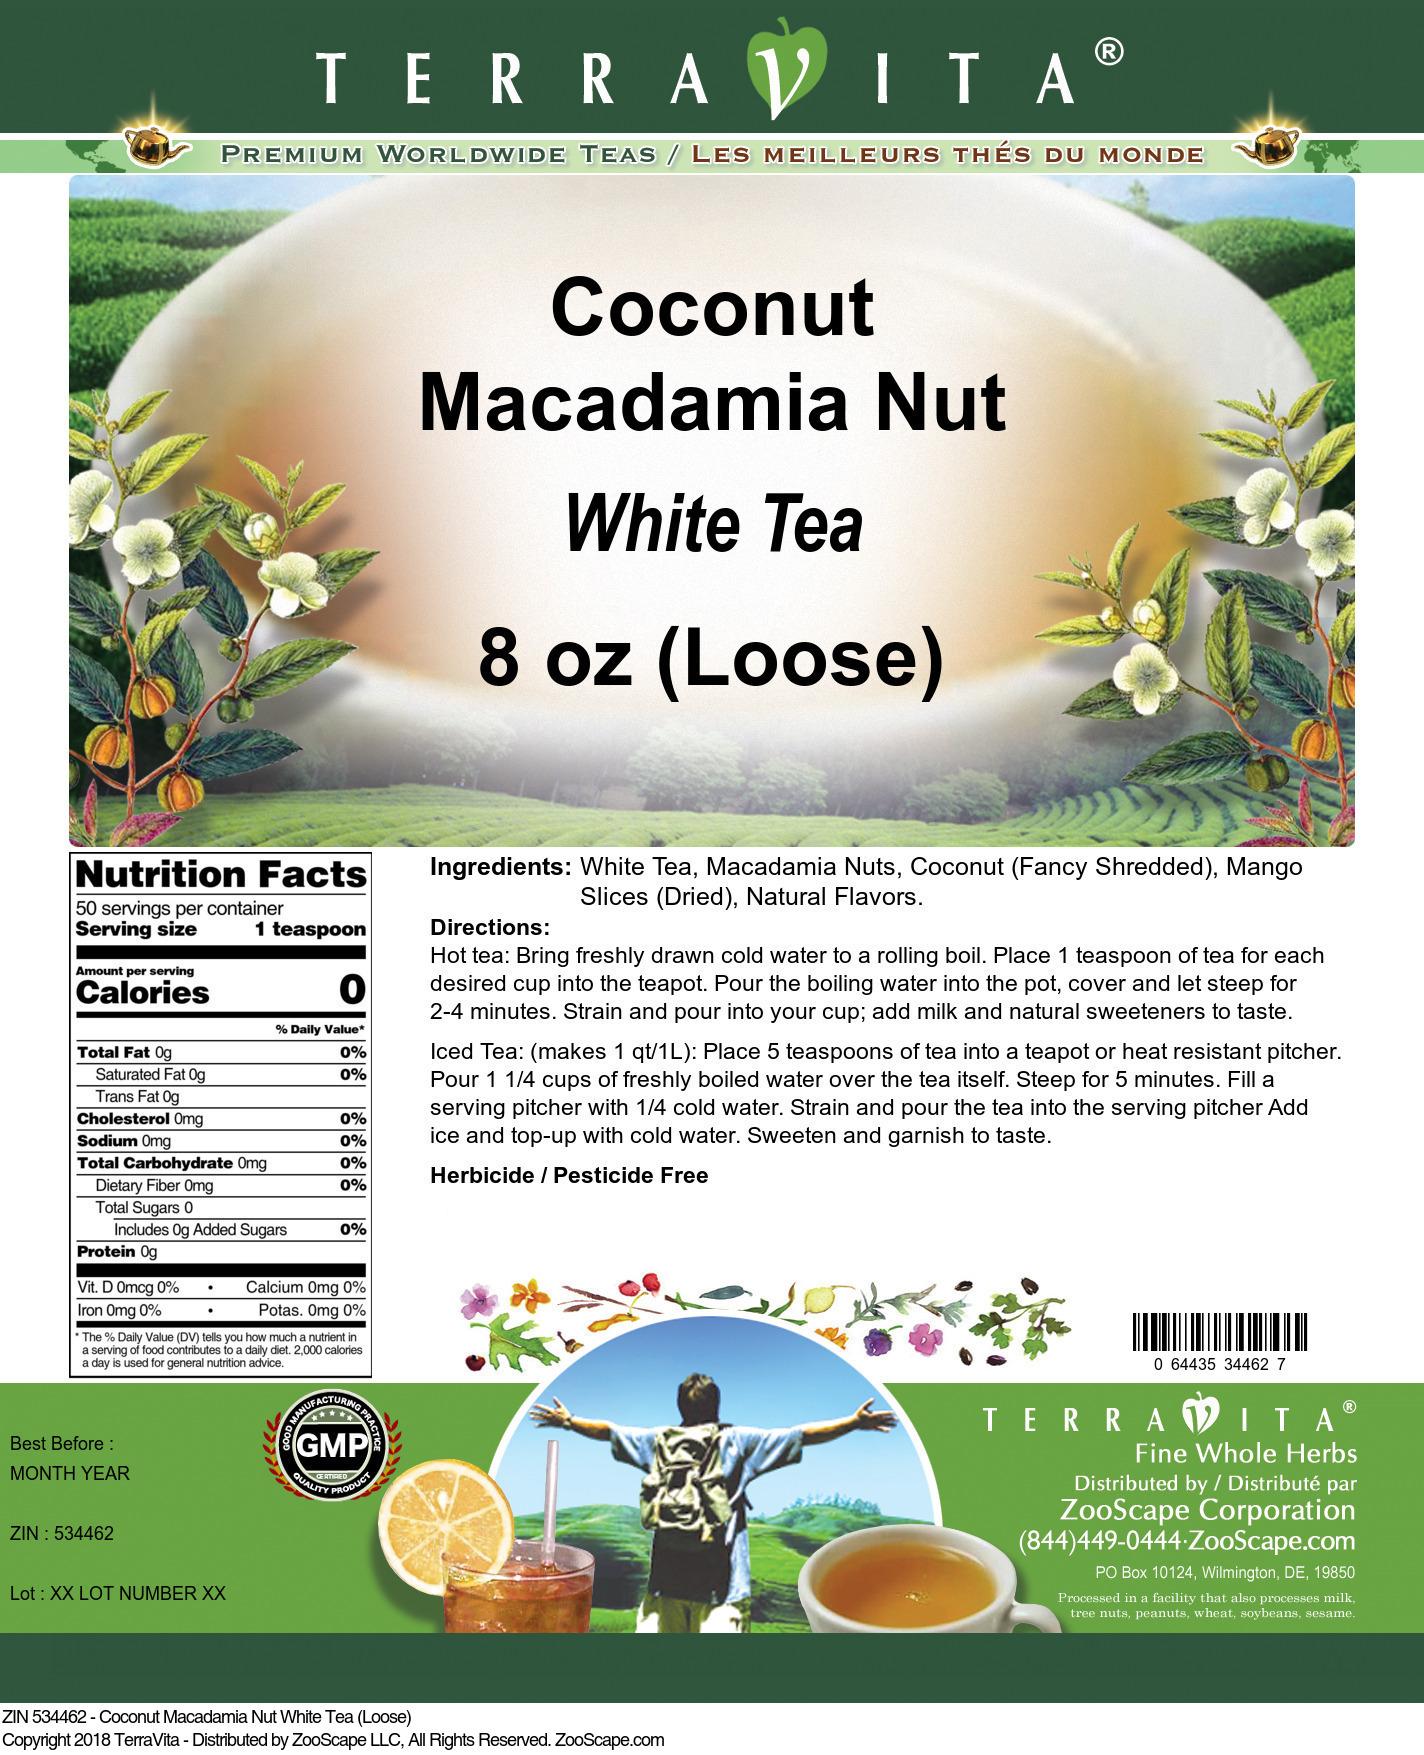 Coconut Macadamia Nut White Tea (Loose)